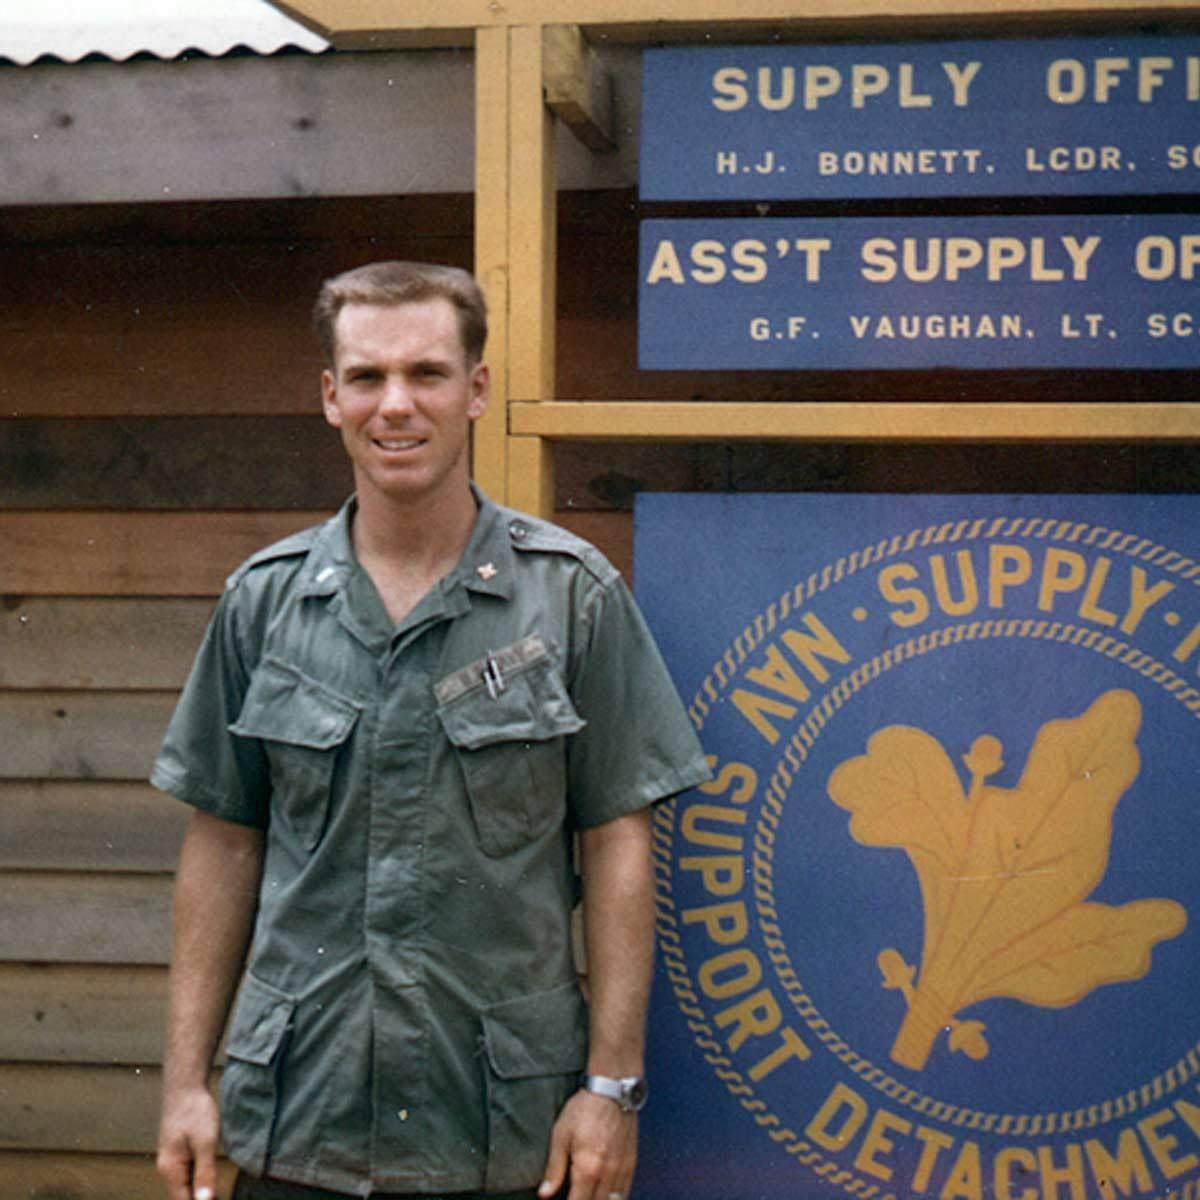 Roger Staubach at Khe Sahn, Vietnam